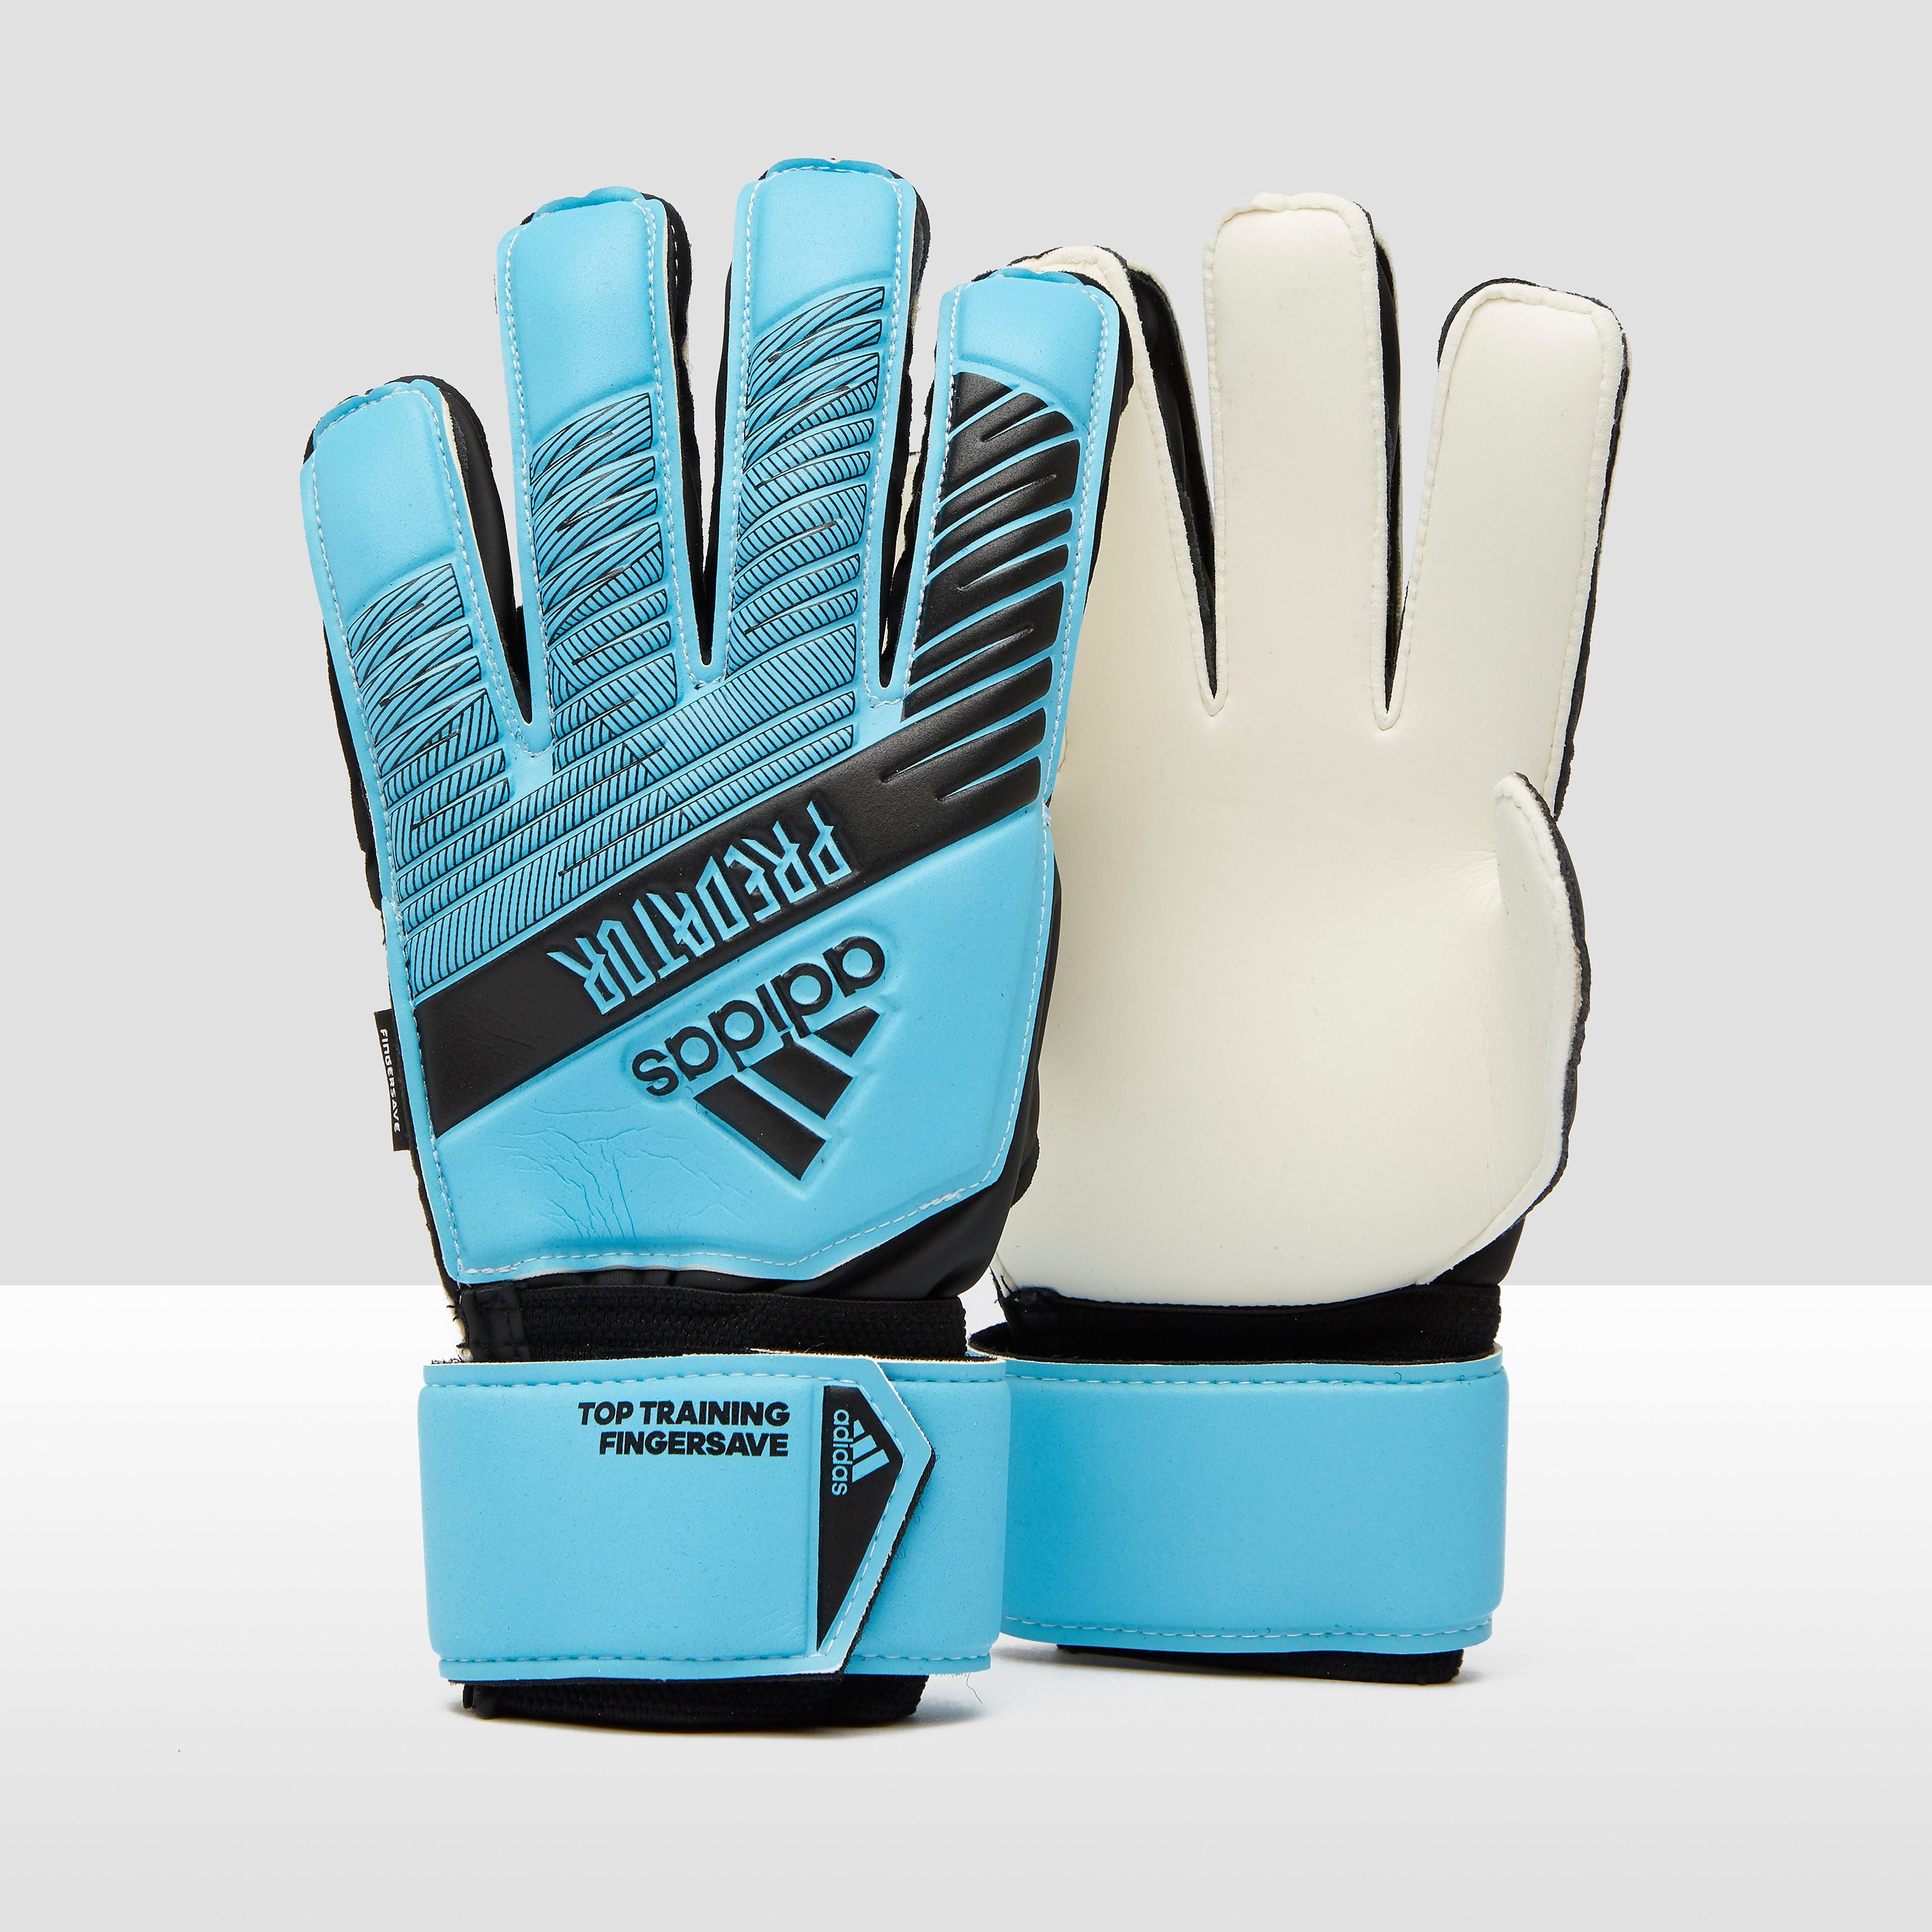 adidas Predator fingersave keepershandschoenen blauw Dames